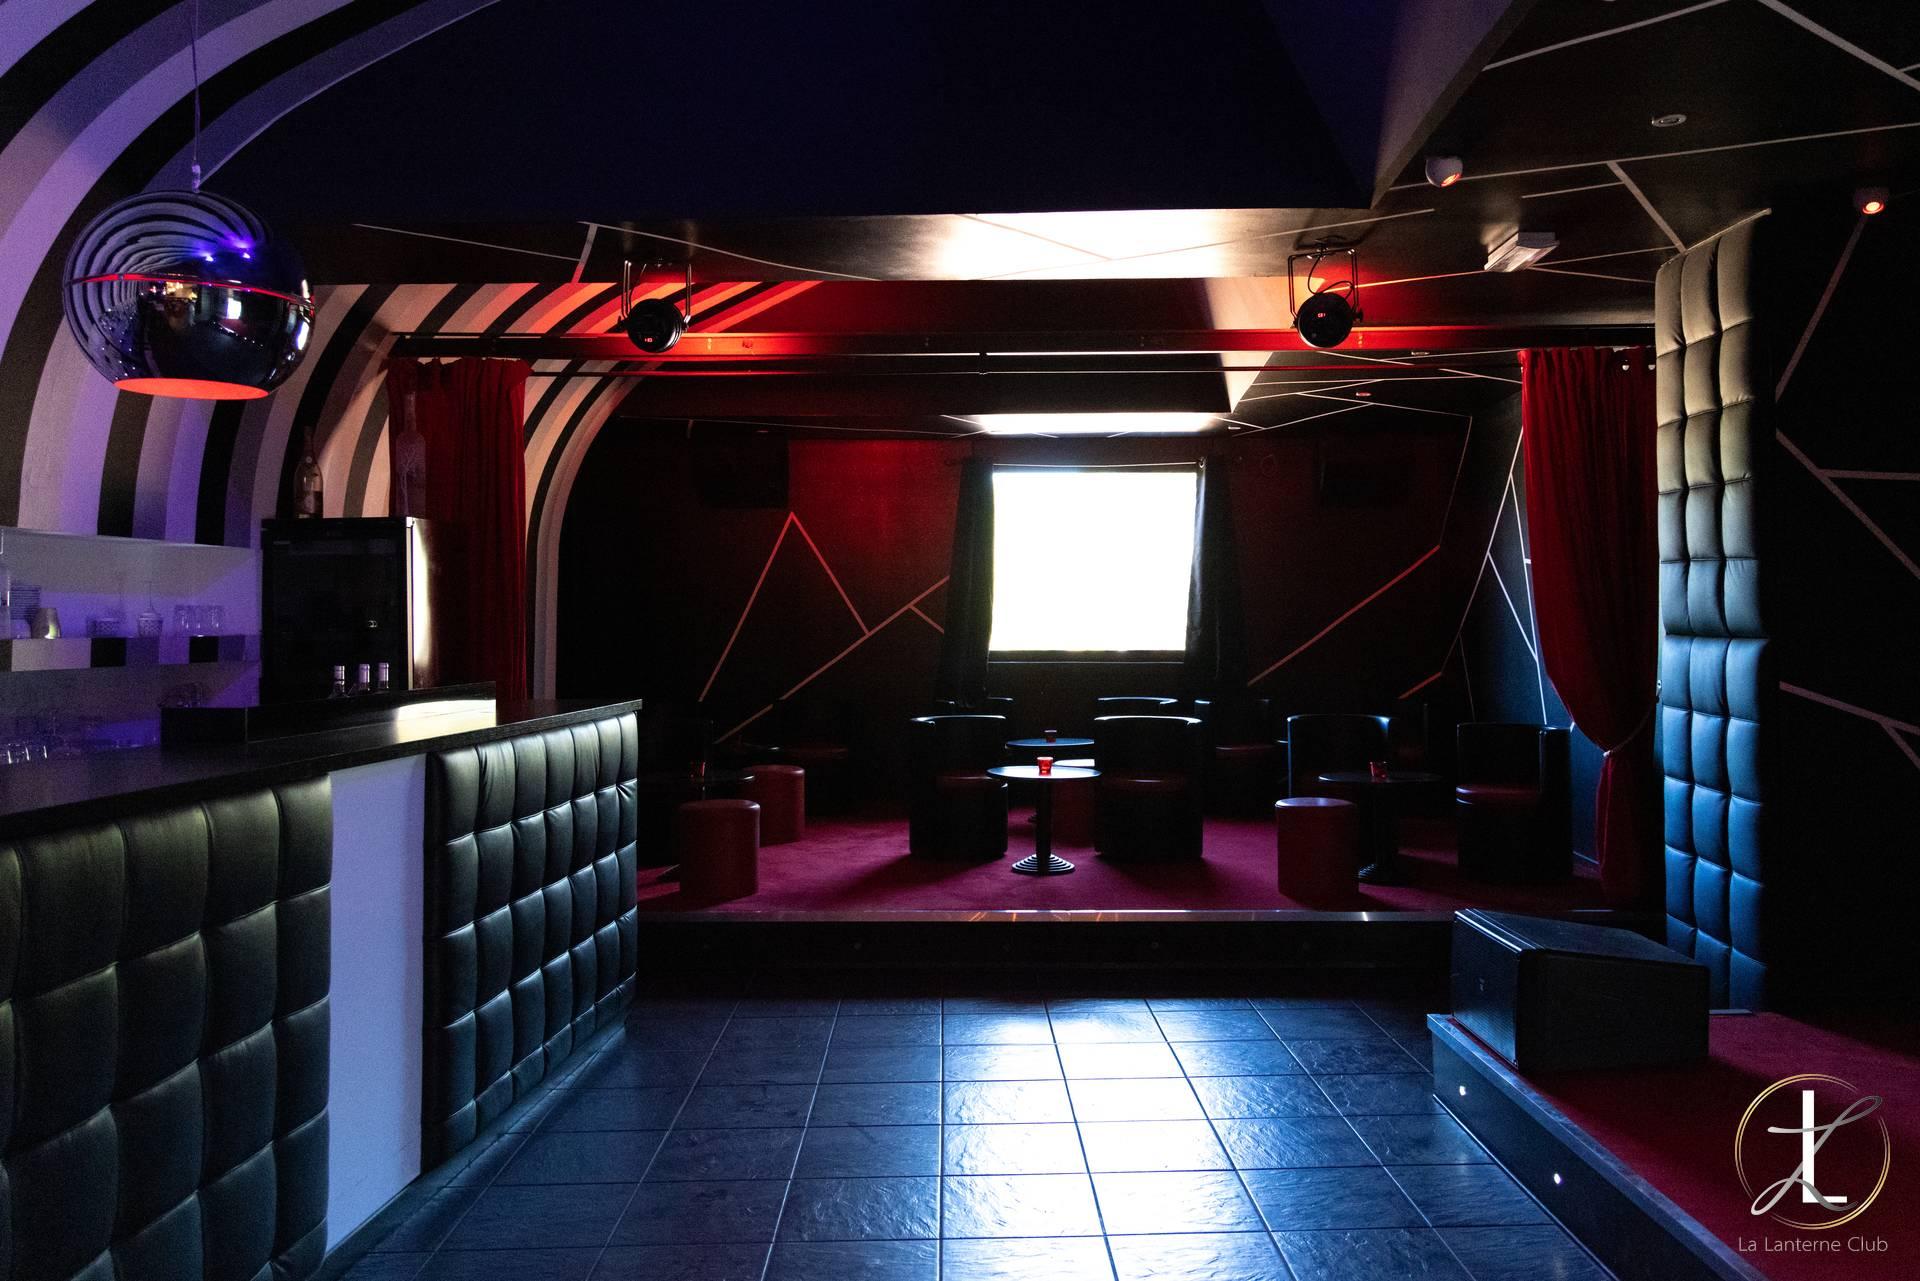 Lanterne Club Aix Restaurant sexe